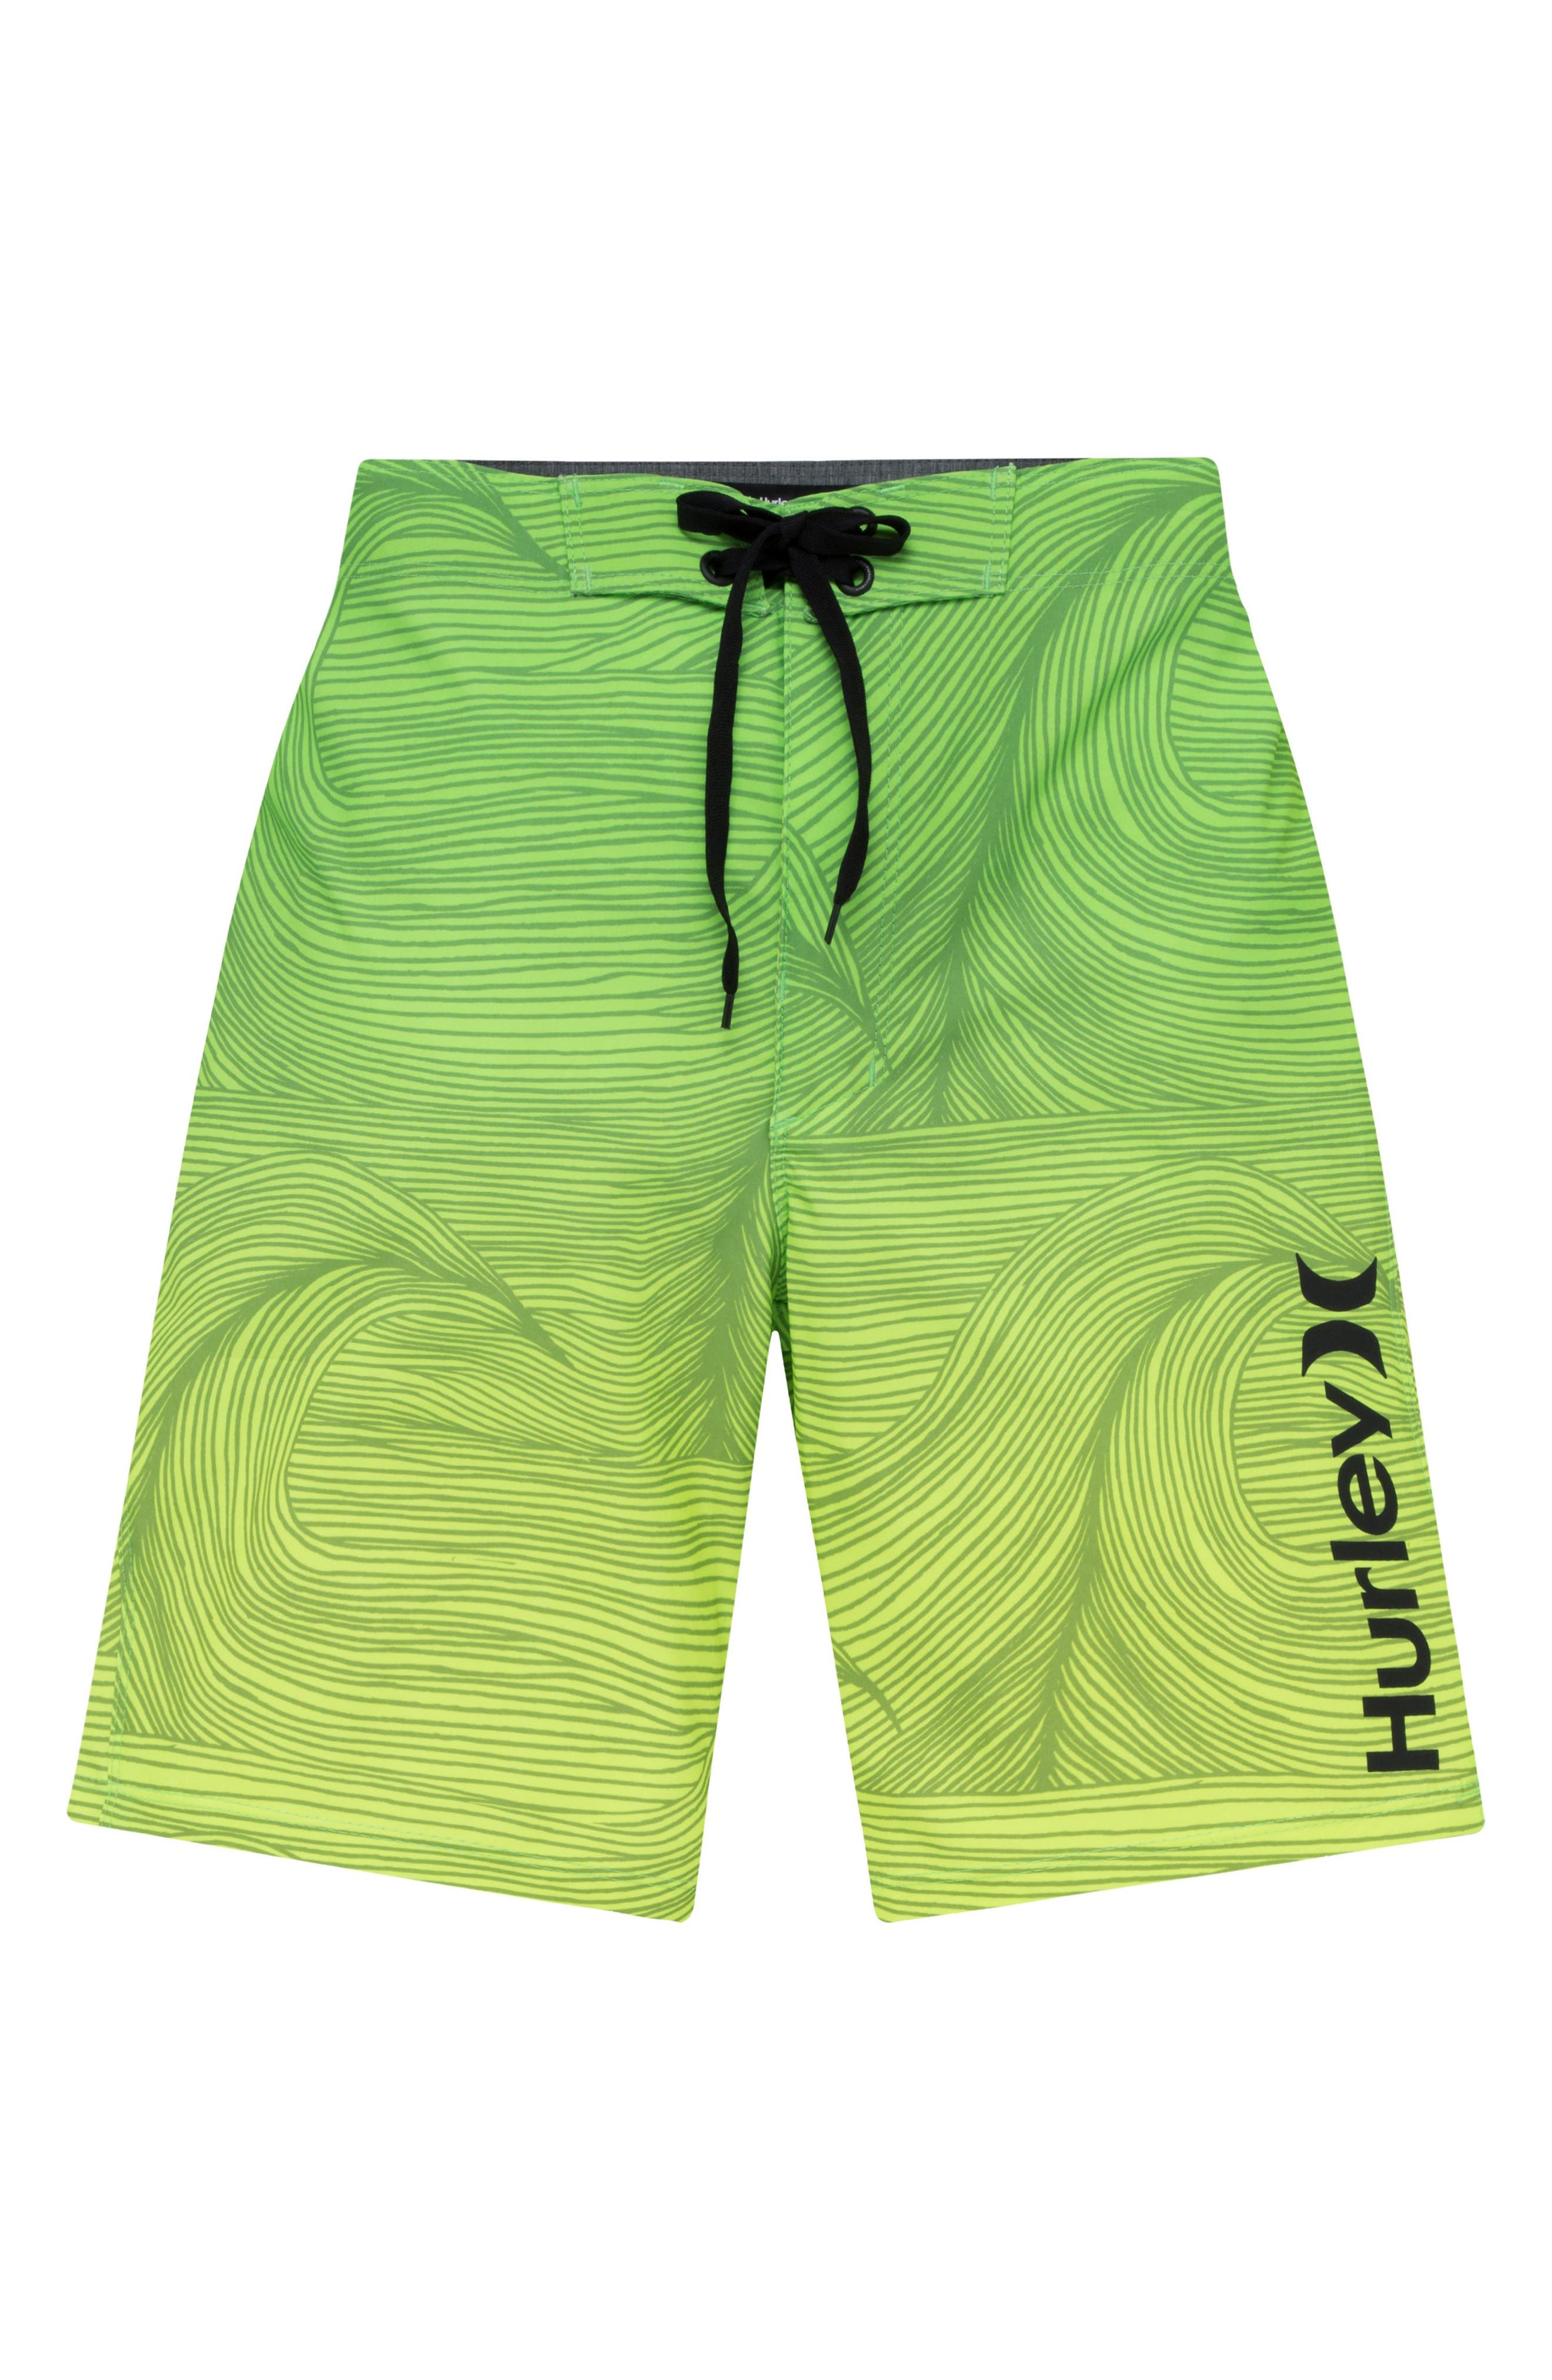 Phantom 30 Brooks Board Shorts,                             Main thumbnail 1, color,                             Voltage Green